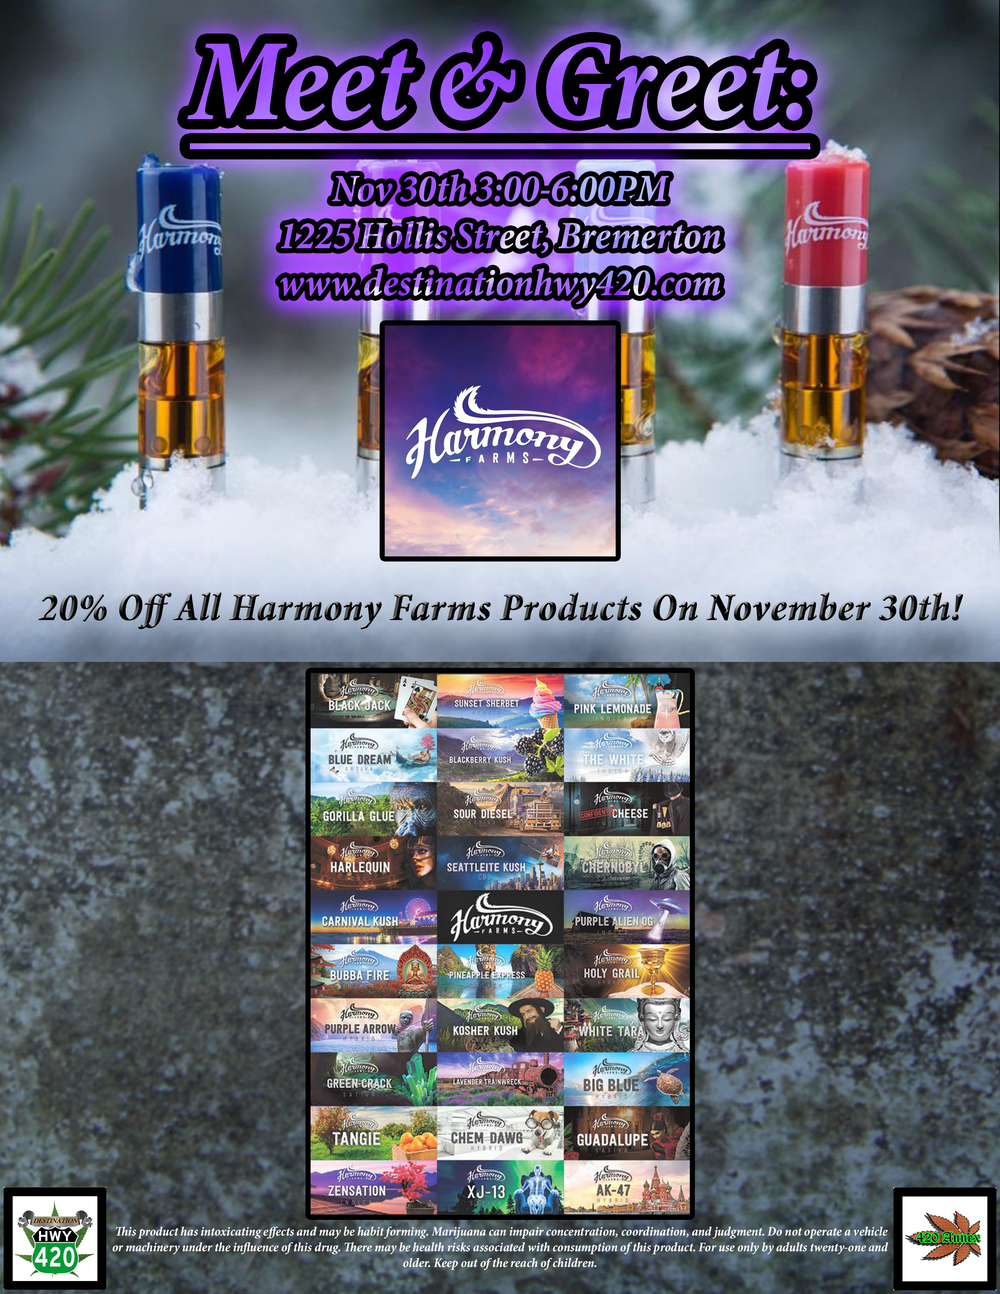 Harmony-Farms-Meet-&-Greet-113018.png